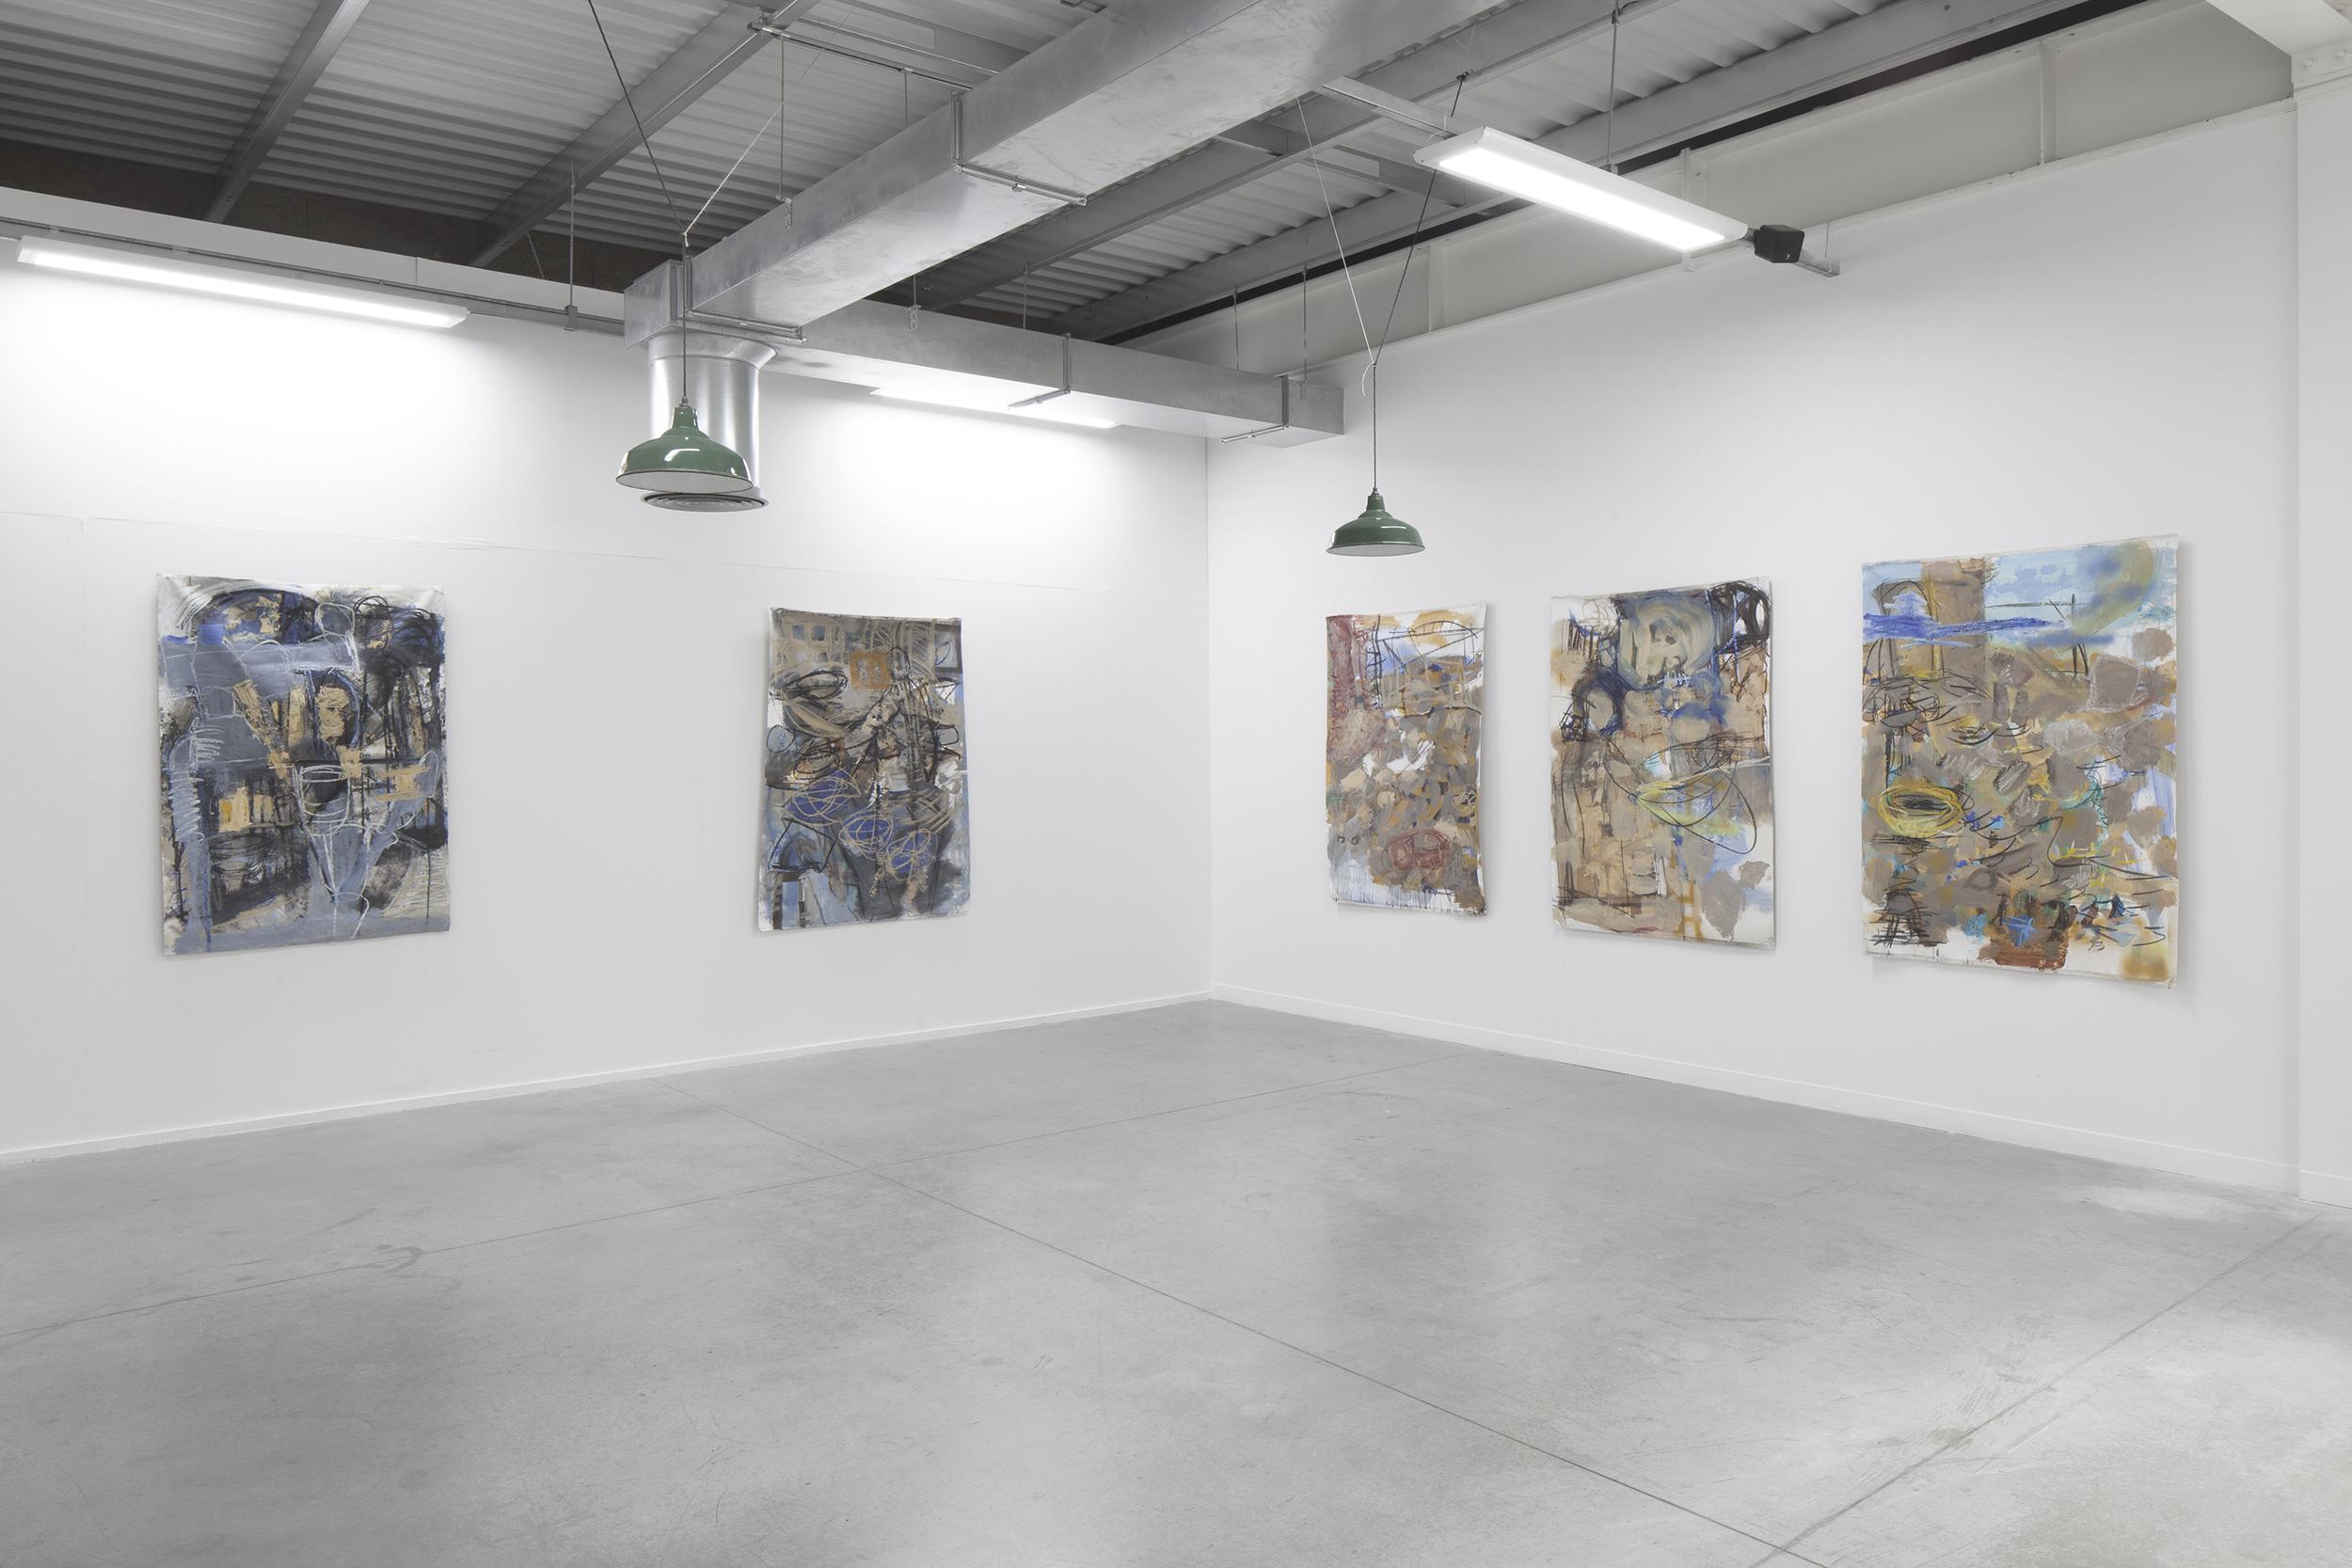 Professional Doctorate Fine Art Showcase installation, Mary Crenshaw